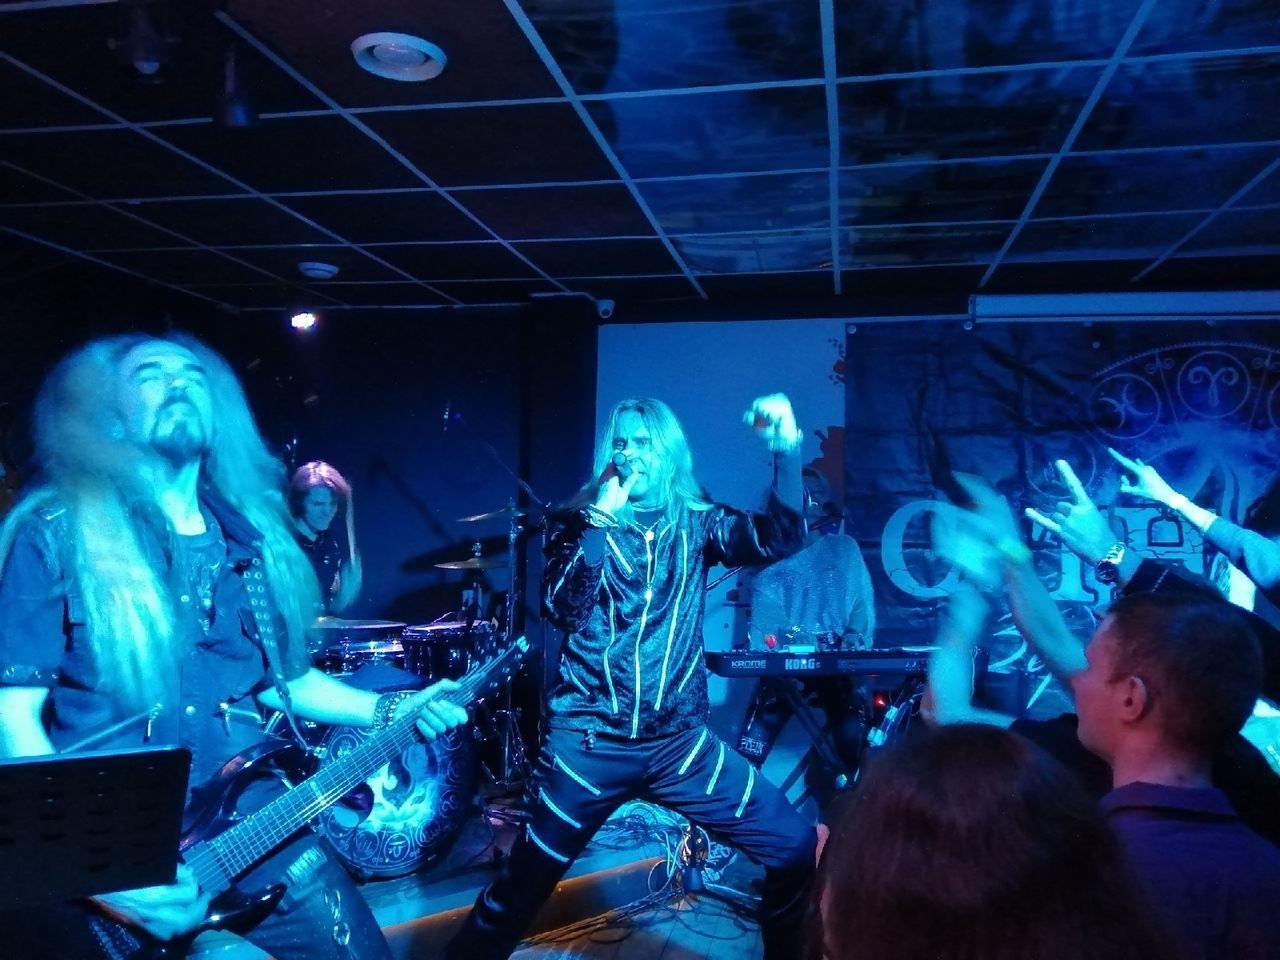 Уютный пауэр-метал: как «Catharsis» выступил в Твери